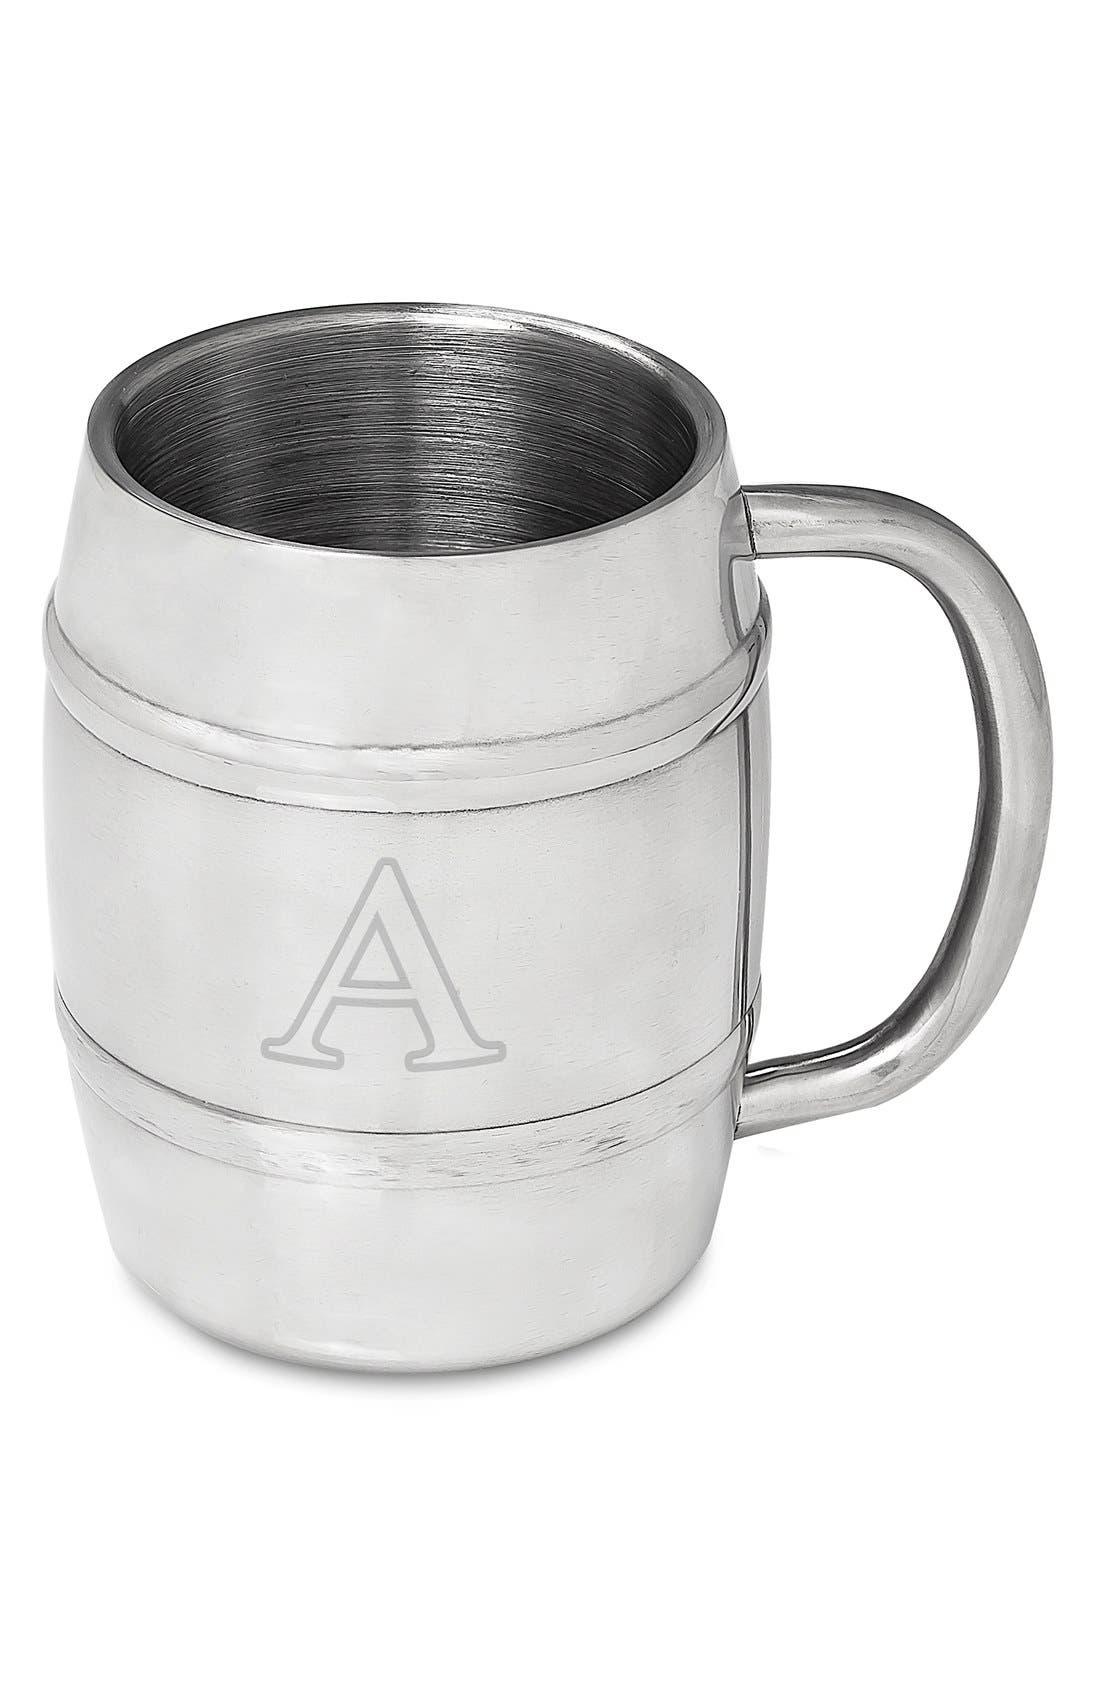 Monogram Stainless Steel Keg Mug,                             Main thumbnail 3, color,